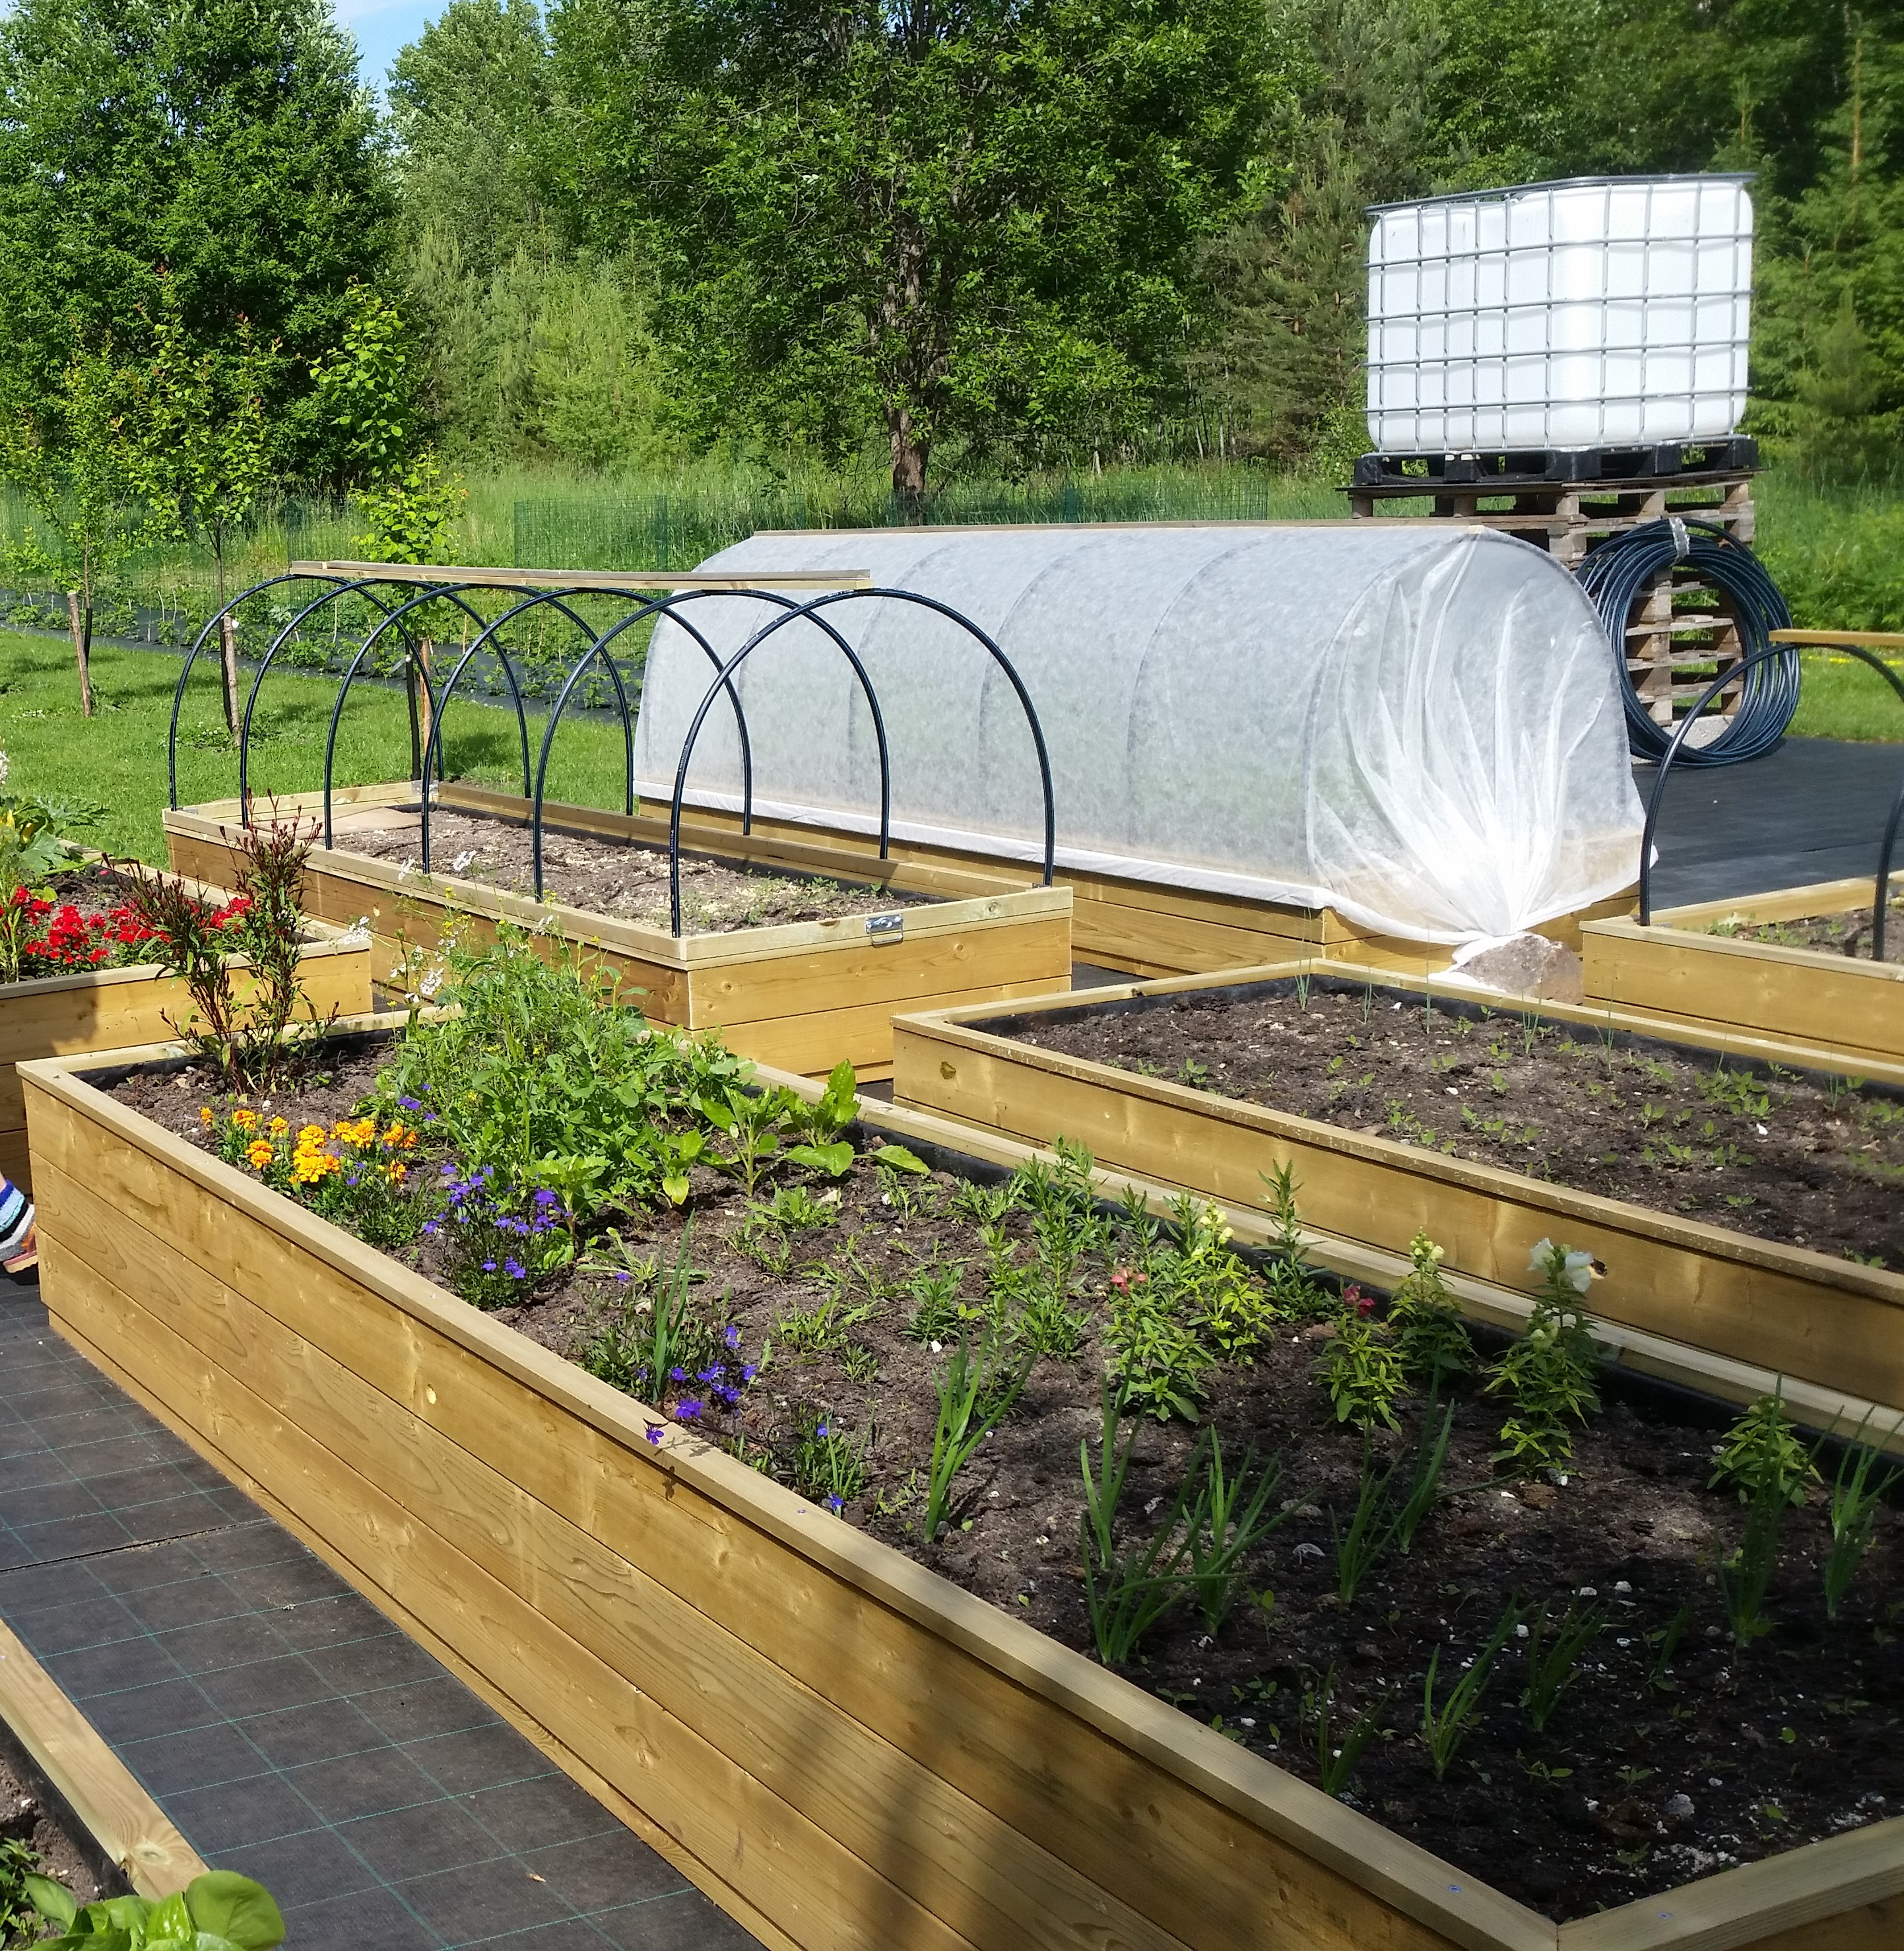 The Vegetable Garden in Estonia